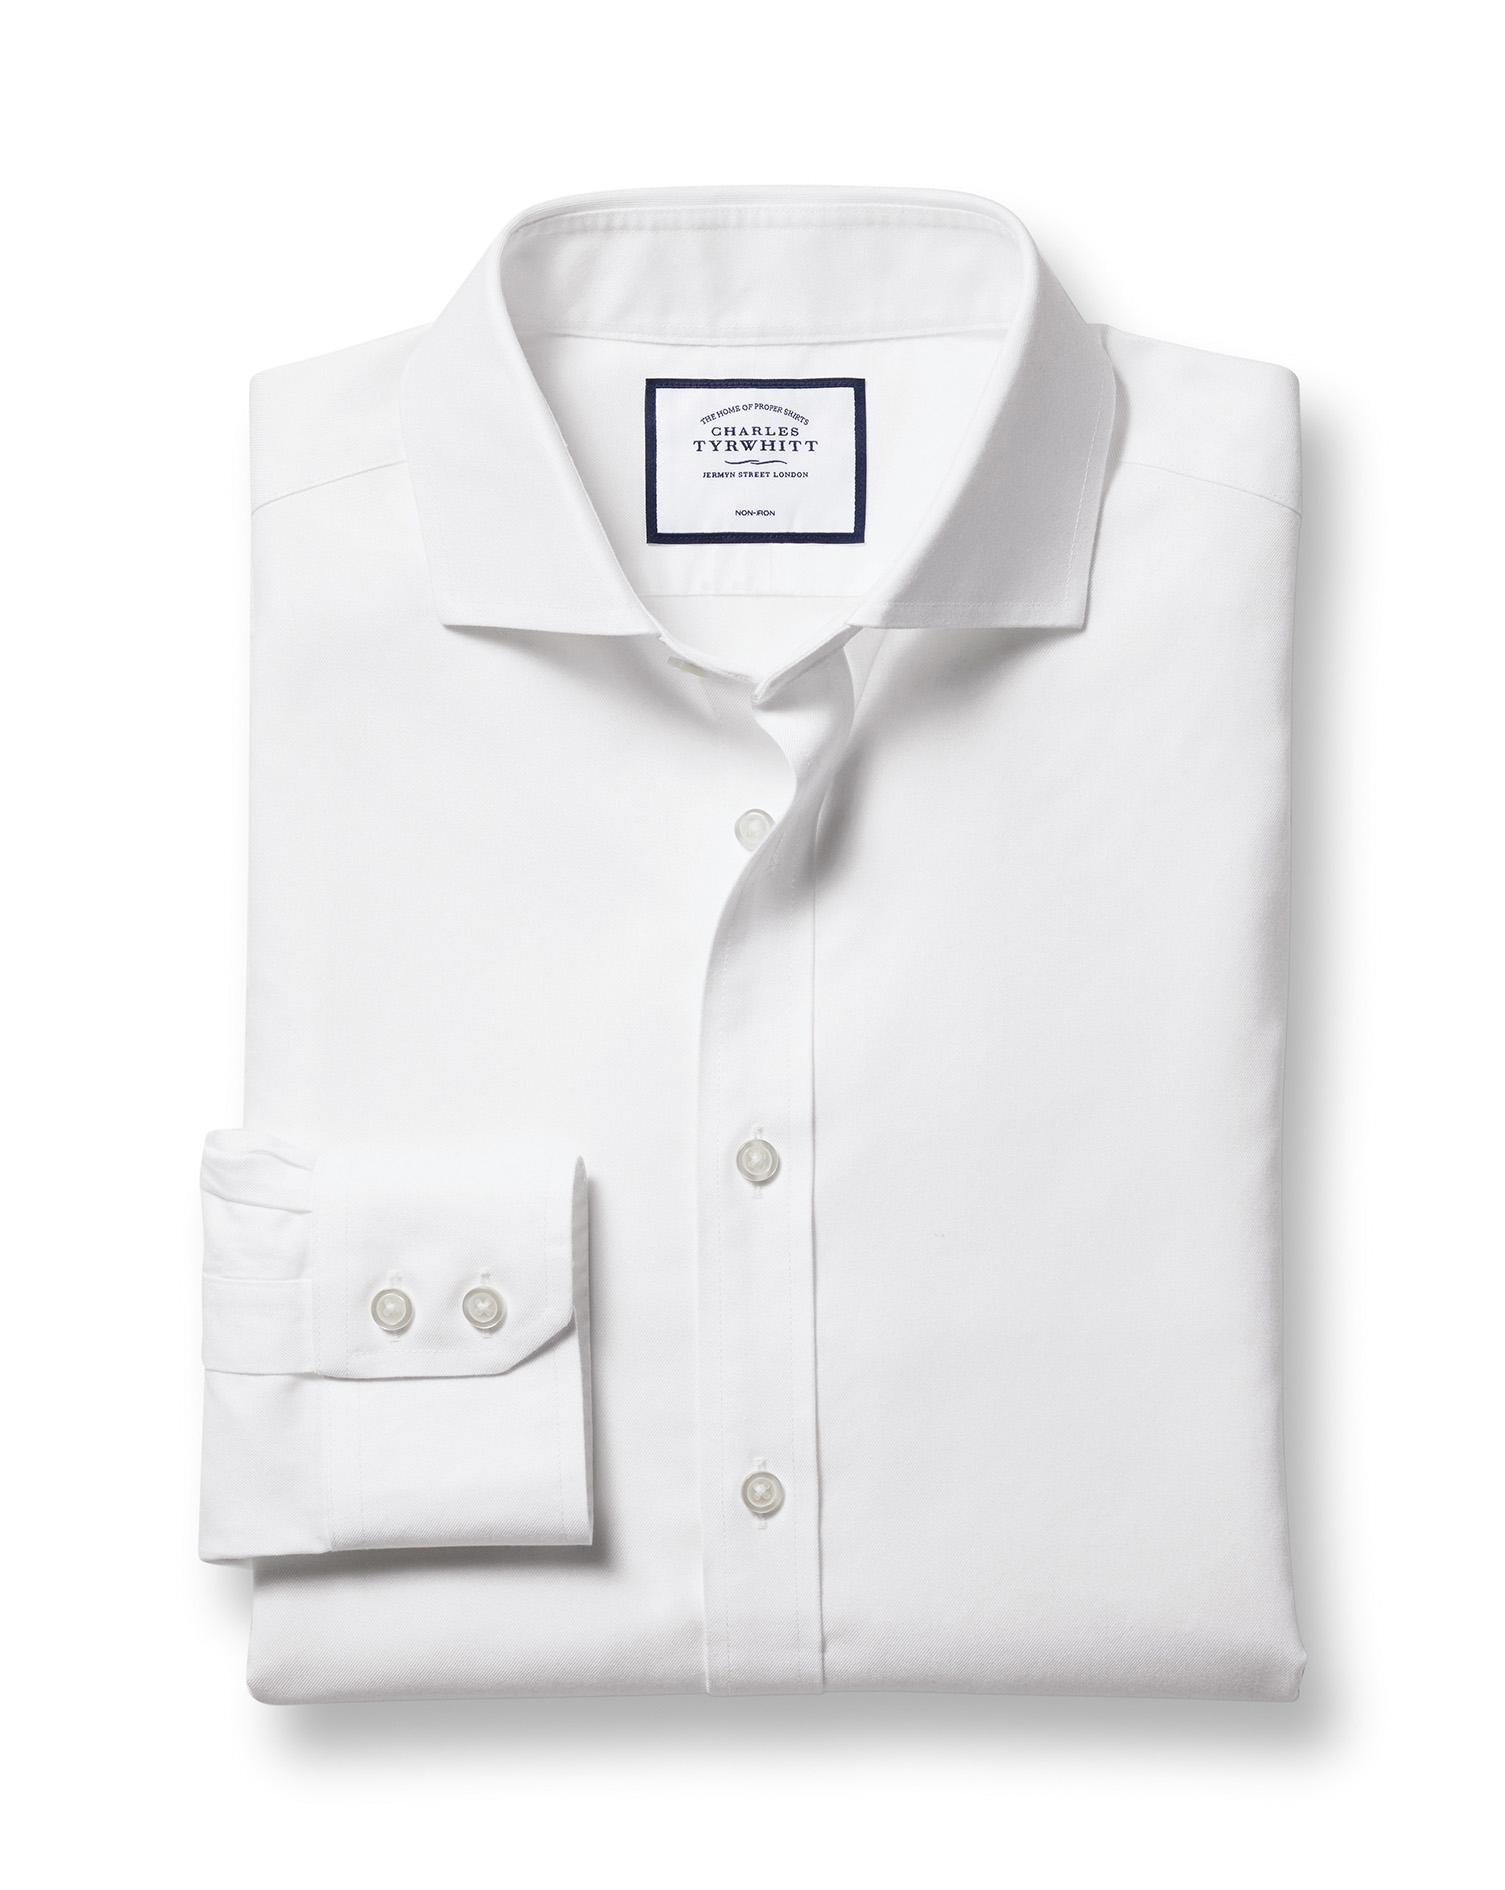 Extra Slim Fit White Non-Iron Twill Cutaway Collar Cotton Formal Shirt by Charles Tyrwhitt